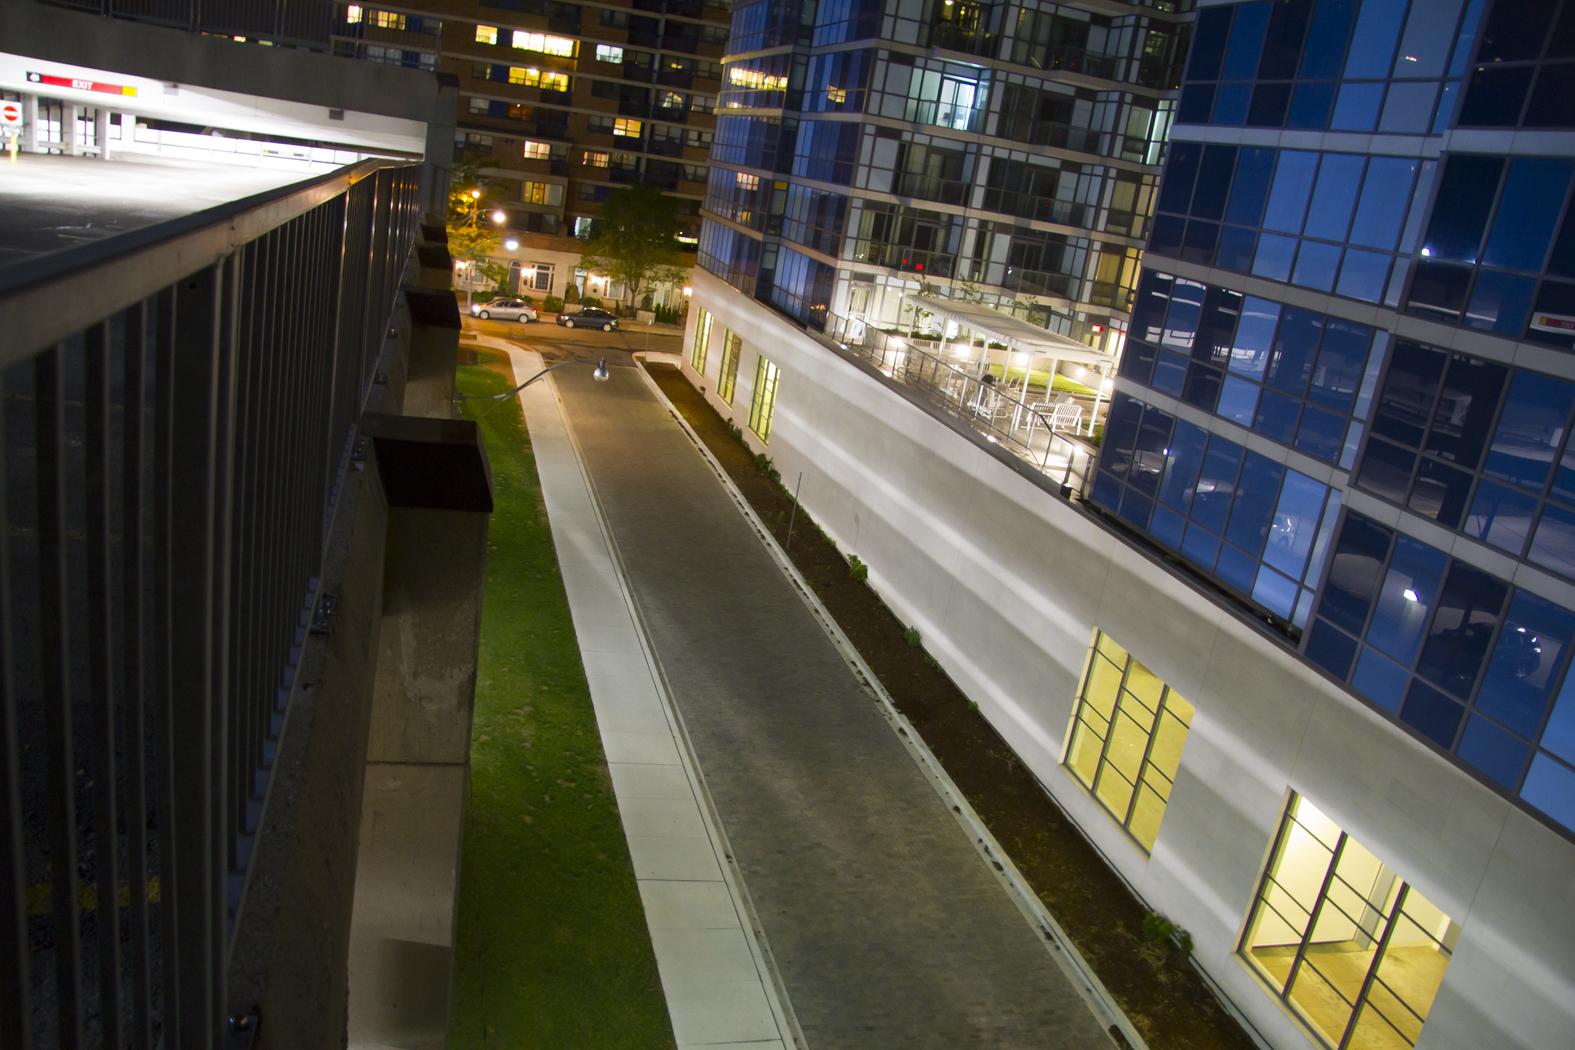 parkade rooftop.jpg